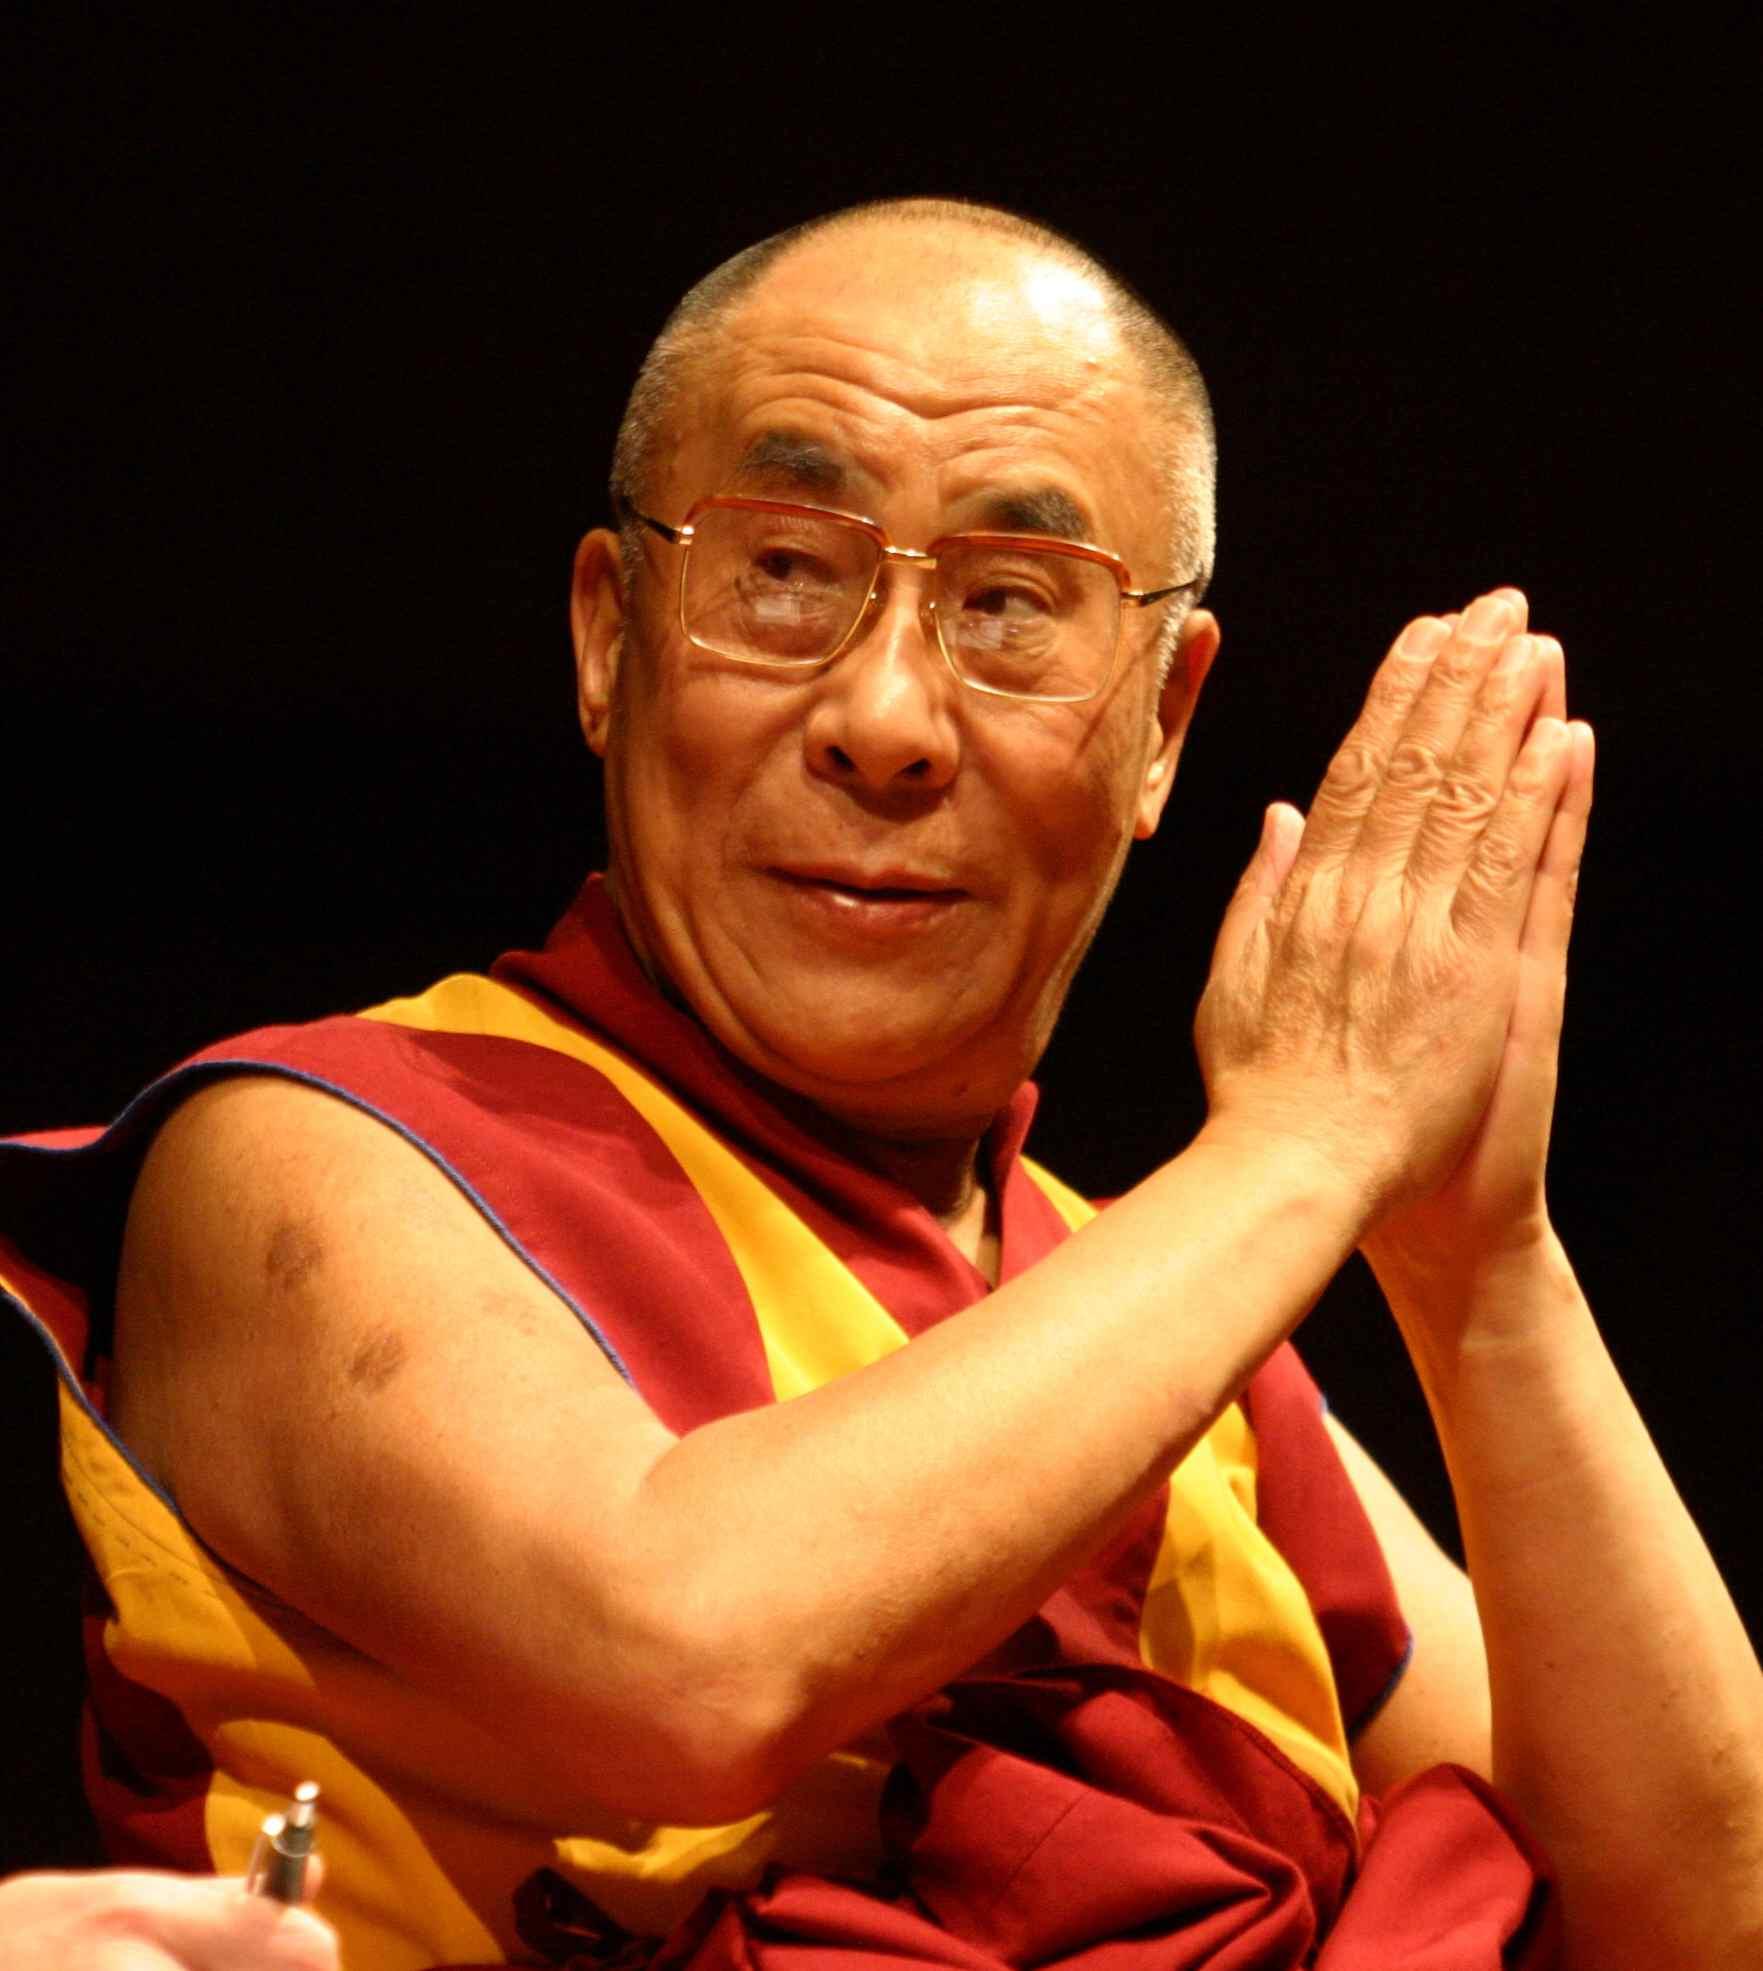 eastasiantimes.com/china-rejects-dalai-lama-on-succession-plans.htm